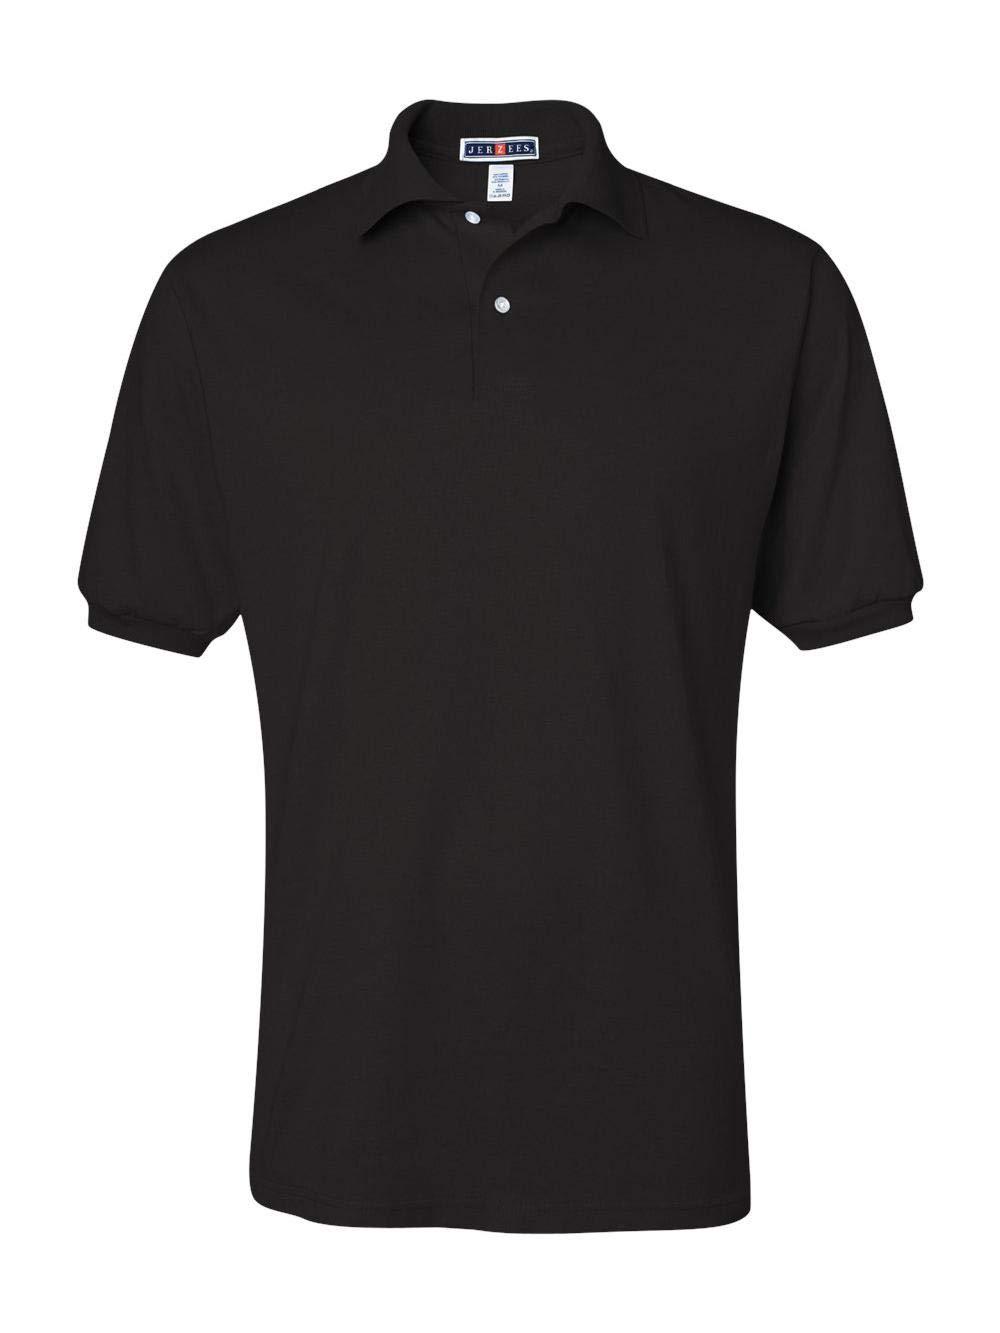 Jerzees Men's Spot Shield Short Sleeve Polo Sport Shirt, Black X-Large by Jerzees (Image #3)